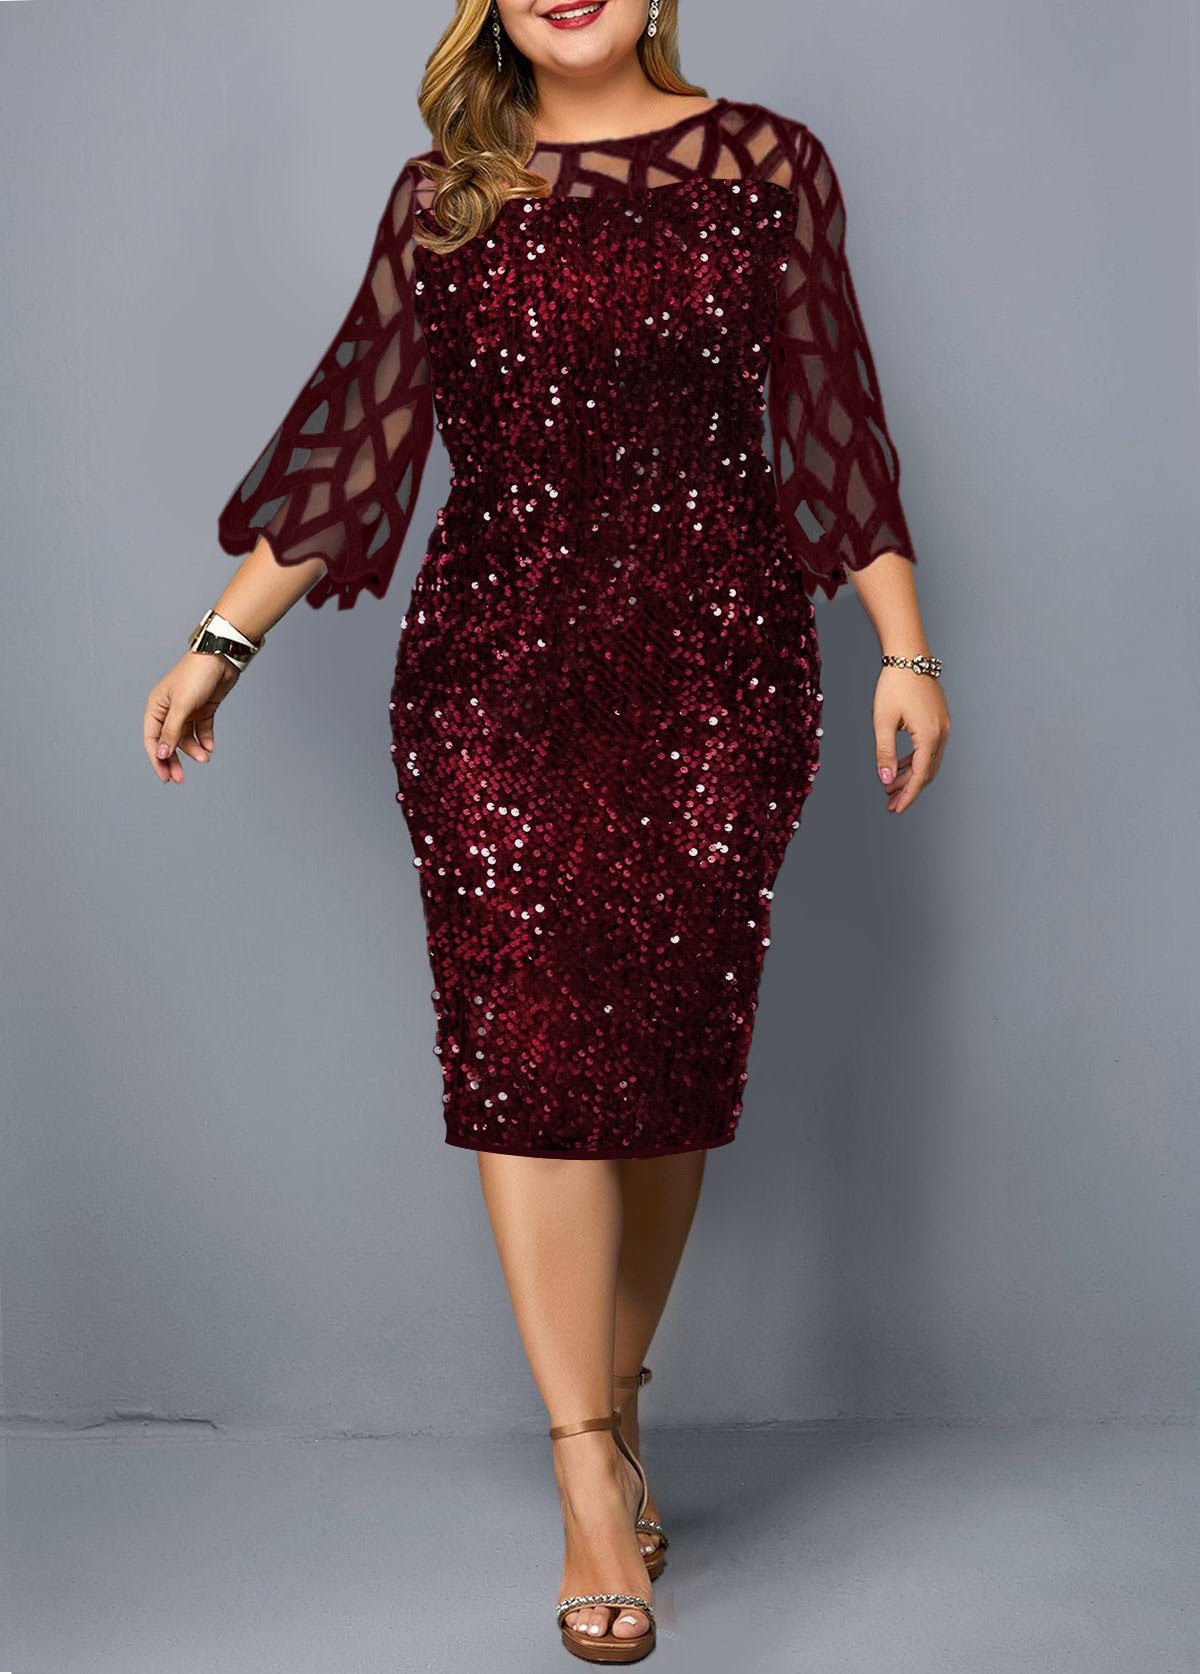 Sequin Mesh Stitching Plus Size Dress